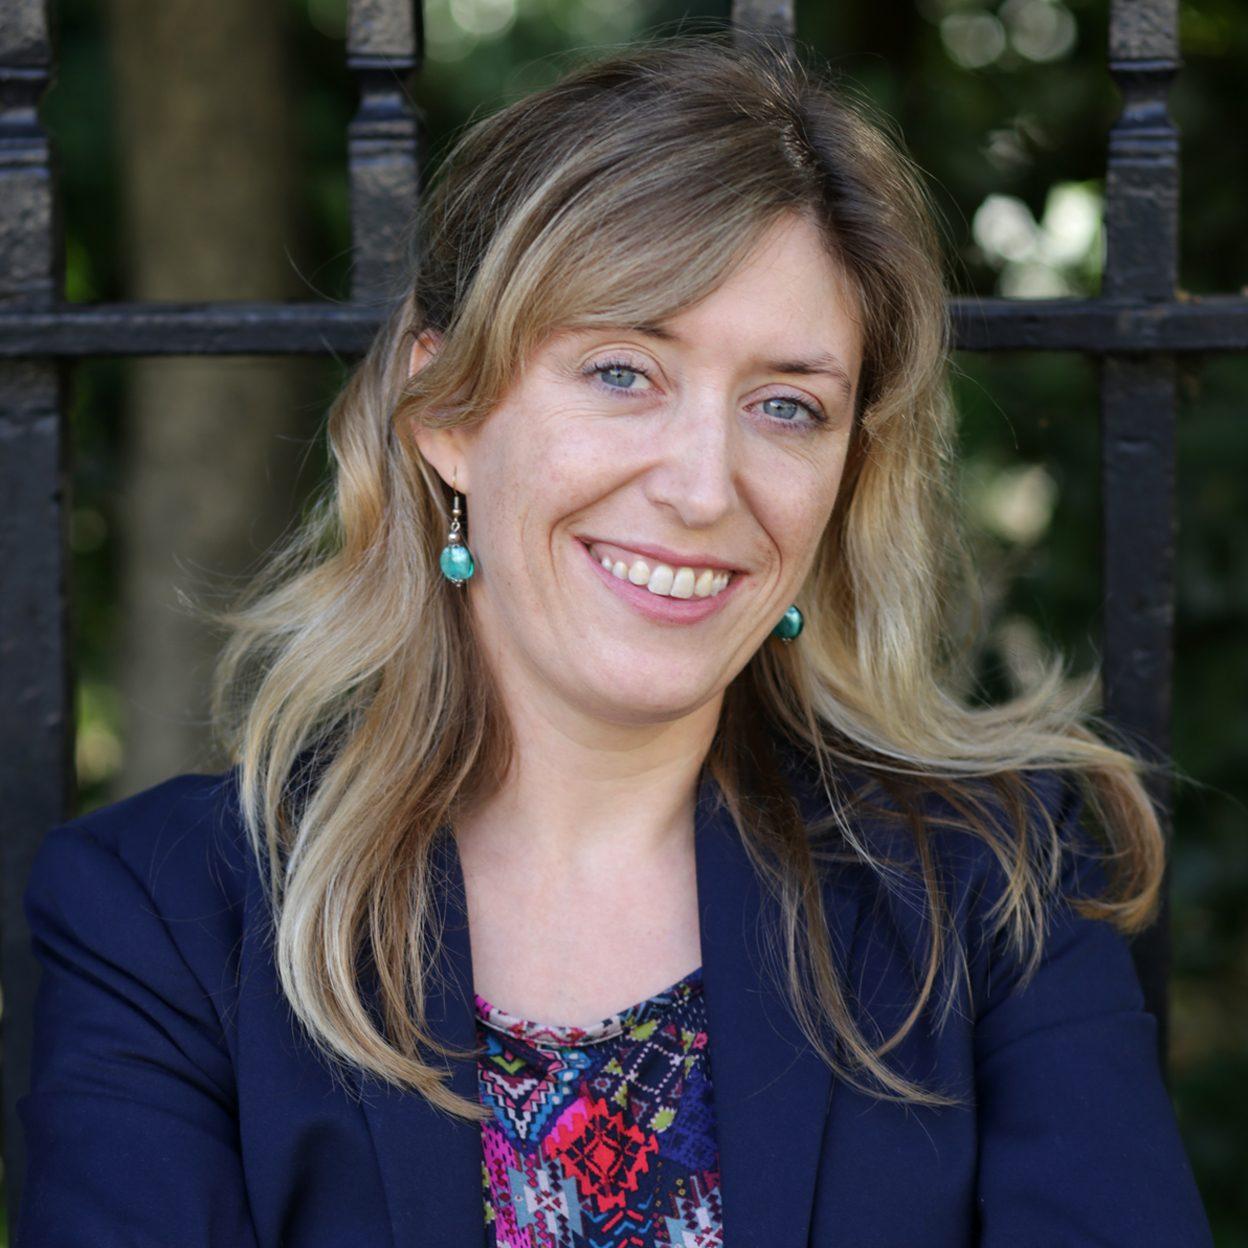 Antonia Gatward Cevizli